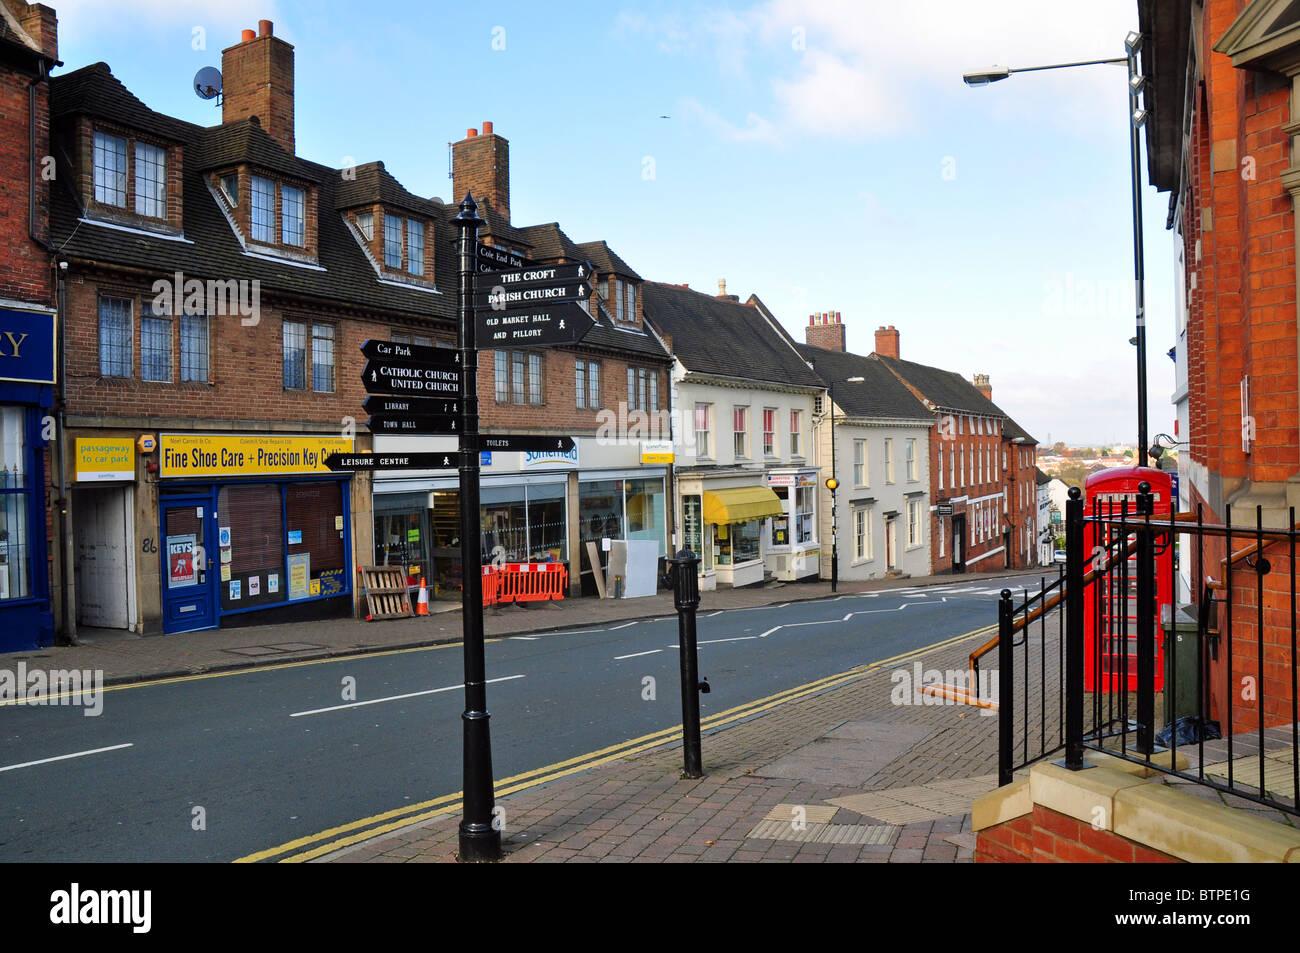 Coleshill, Warwickshire, England: the High Street - Stock Image